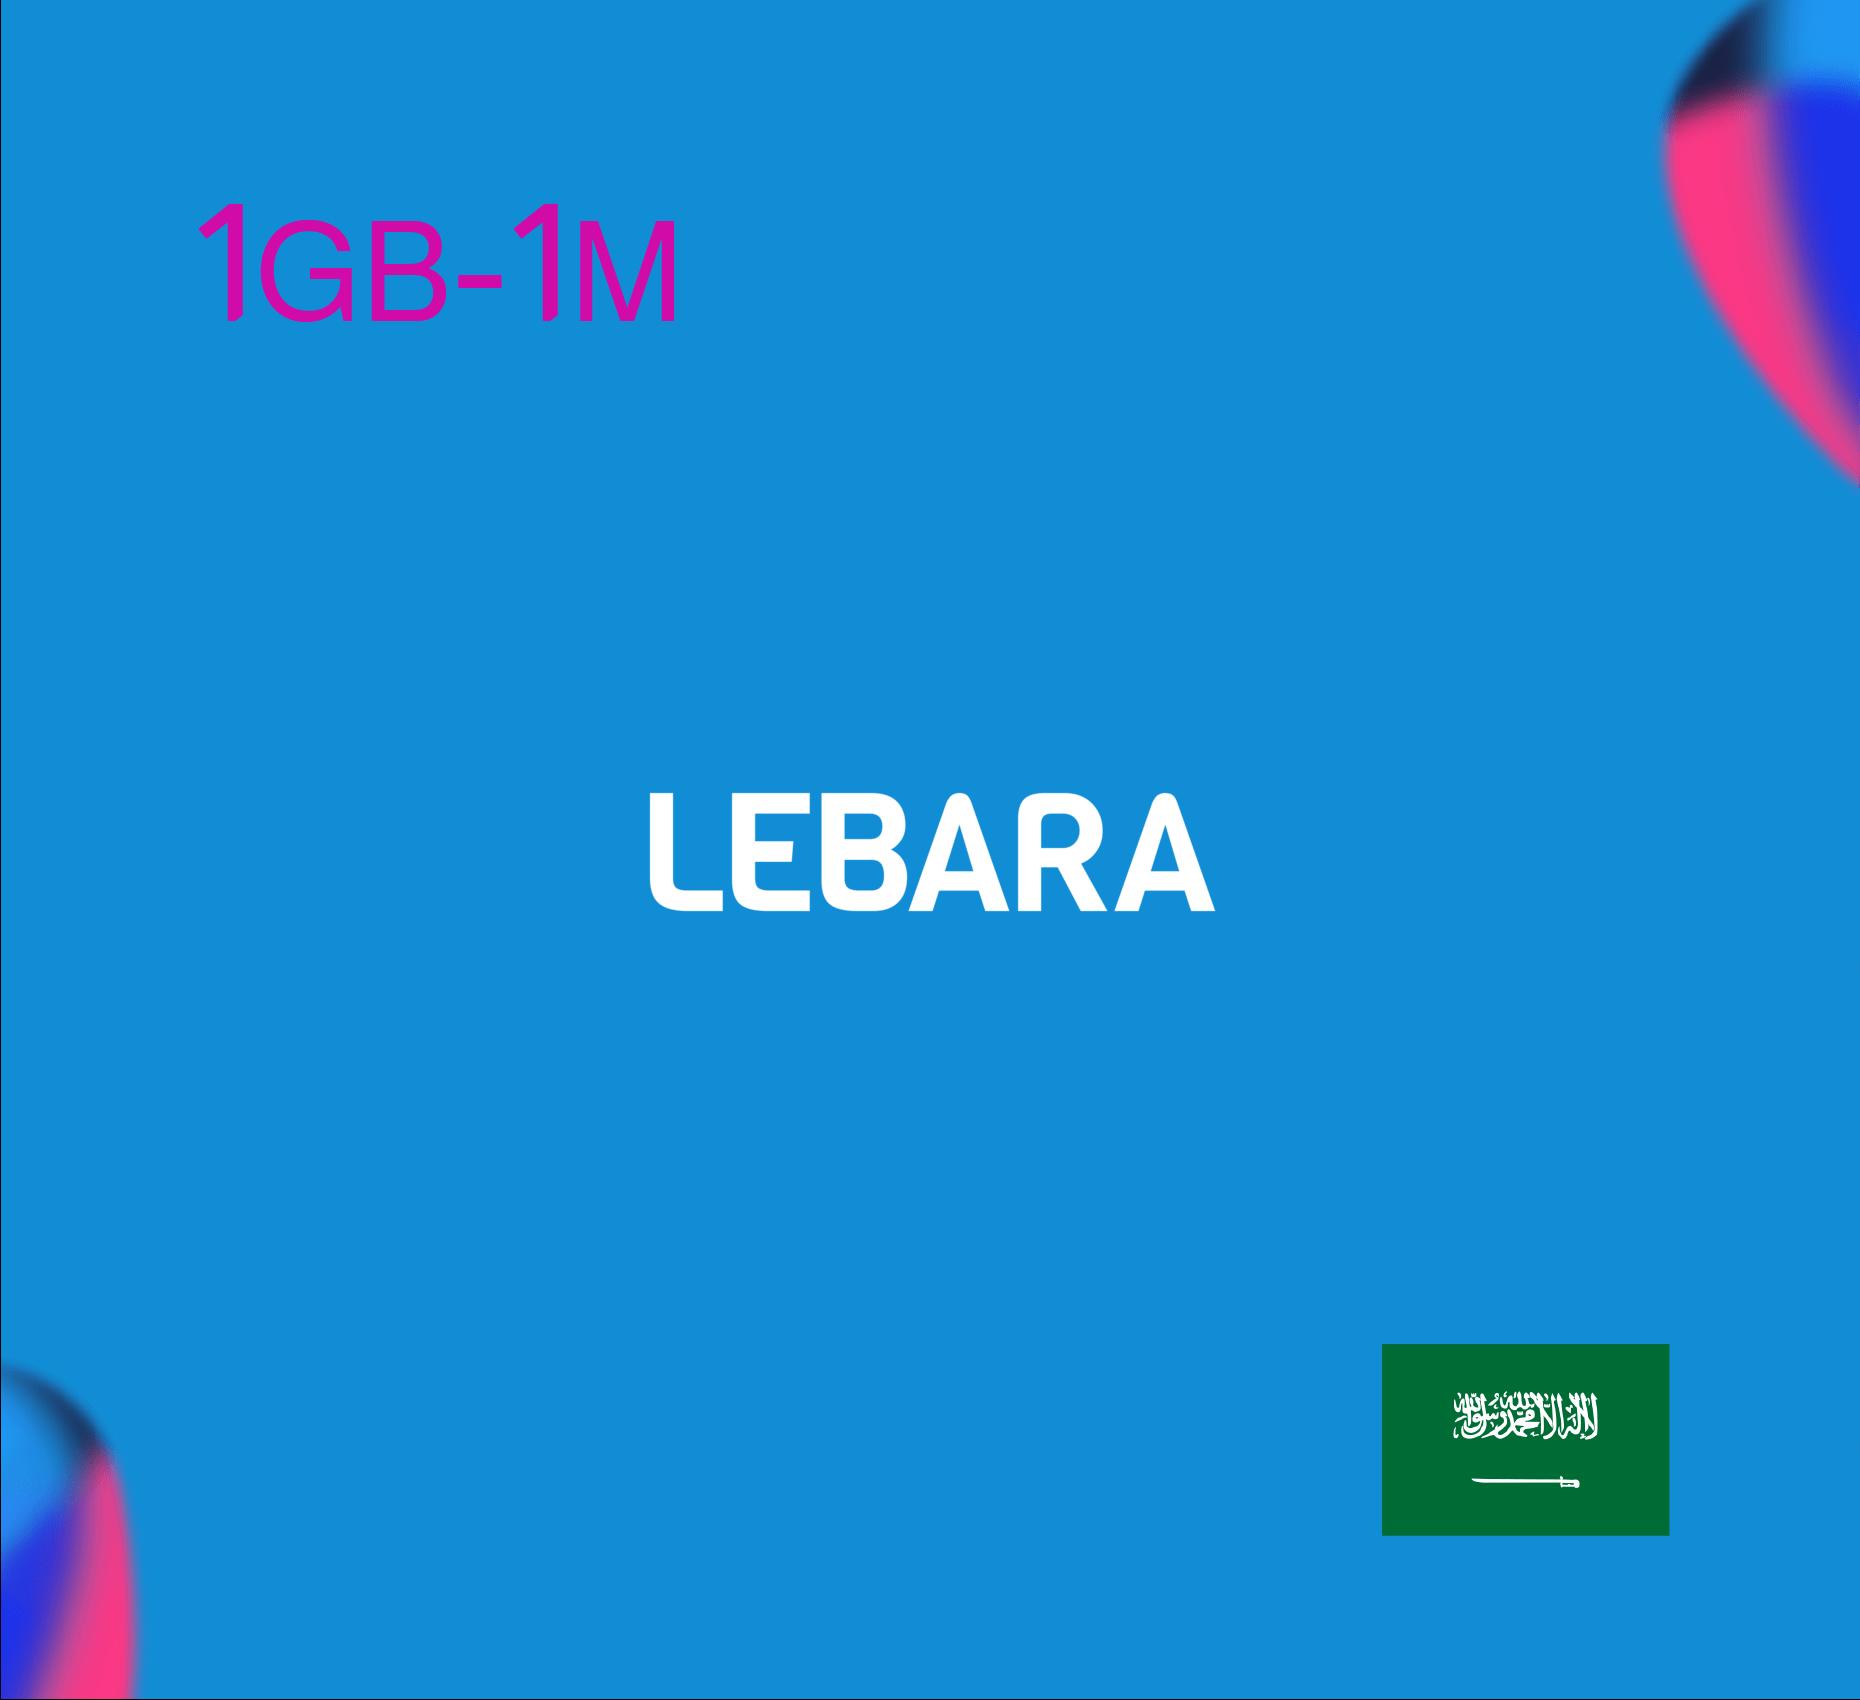 Lebara Data Recharge 1GB - 1 Month